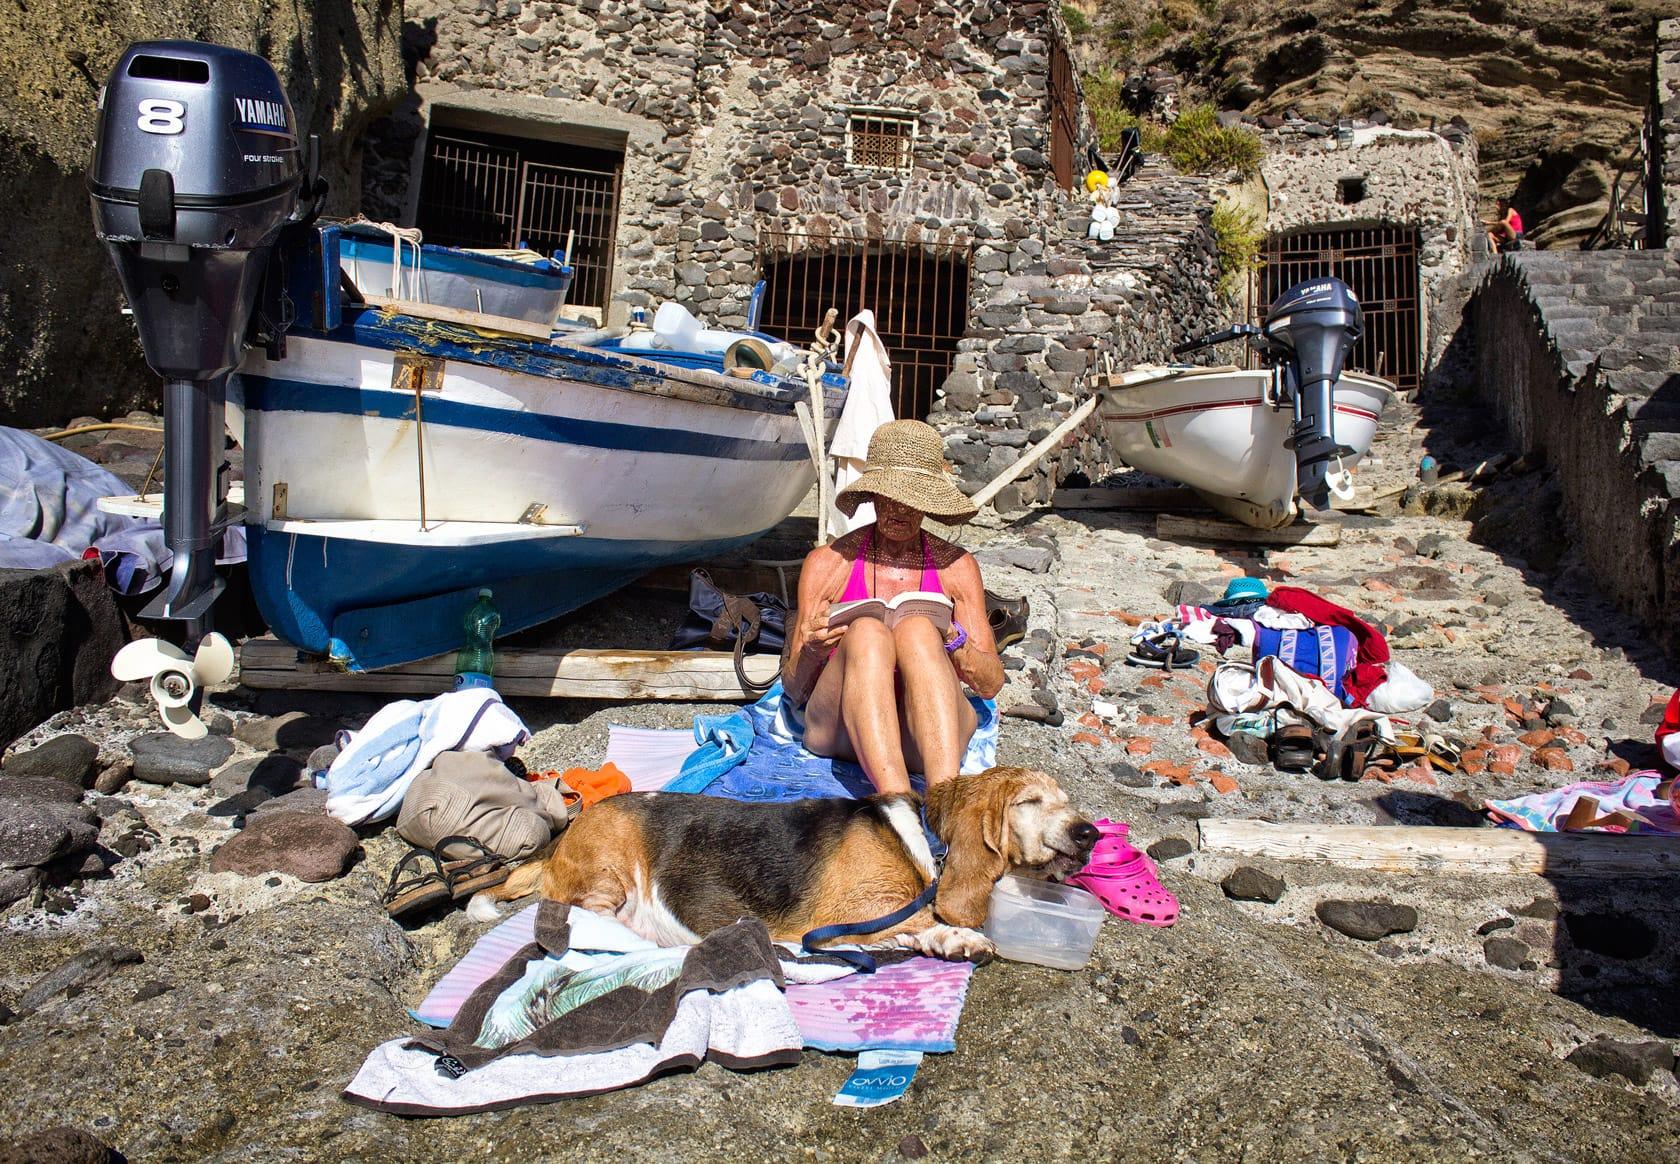 Lorenzo Grifantini Beach Street Photography 2